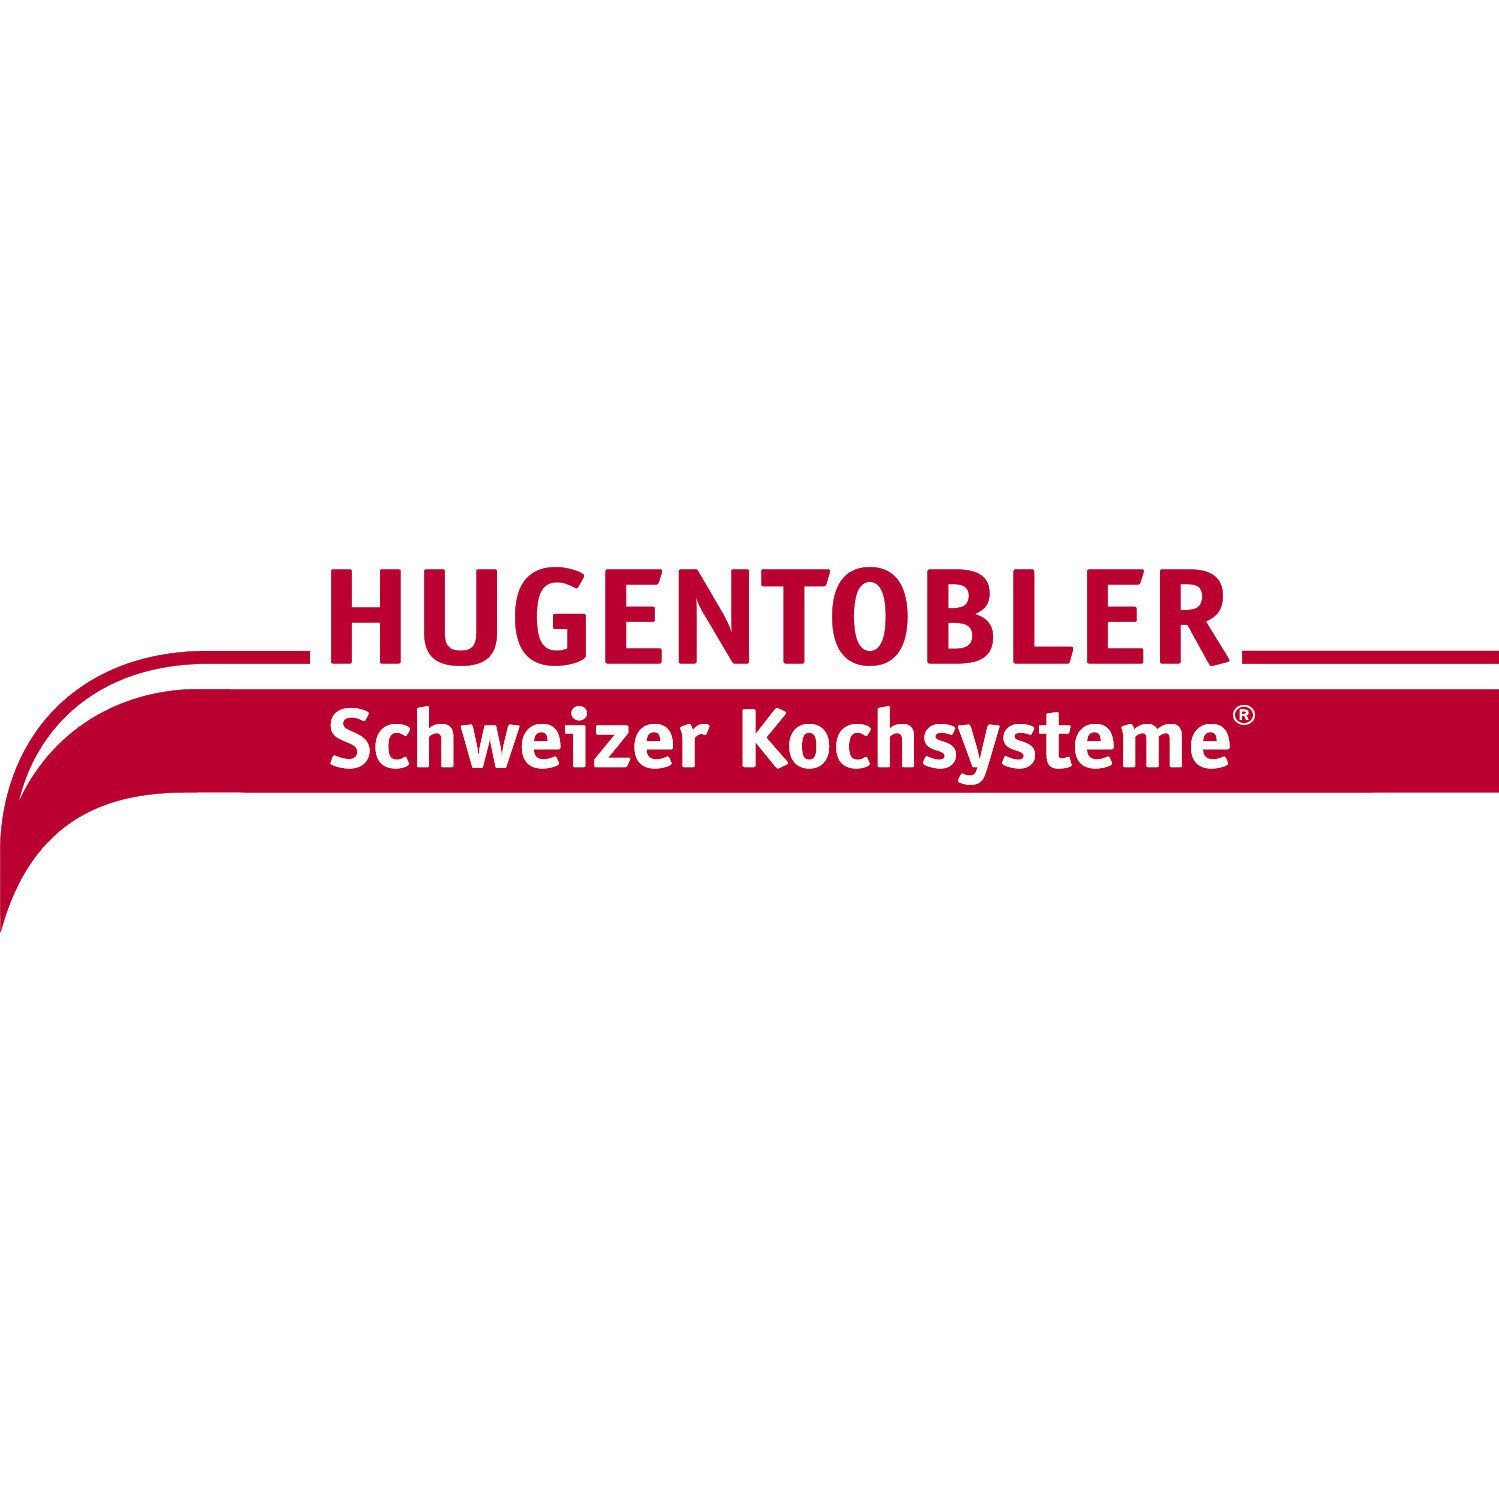 Hugentobler_Schönbühl.jpg